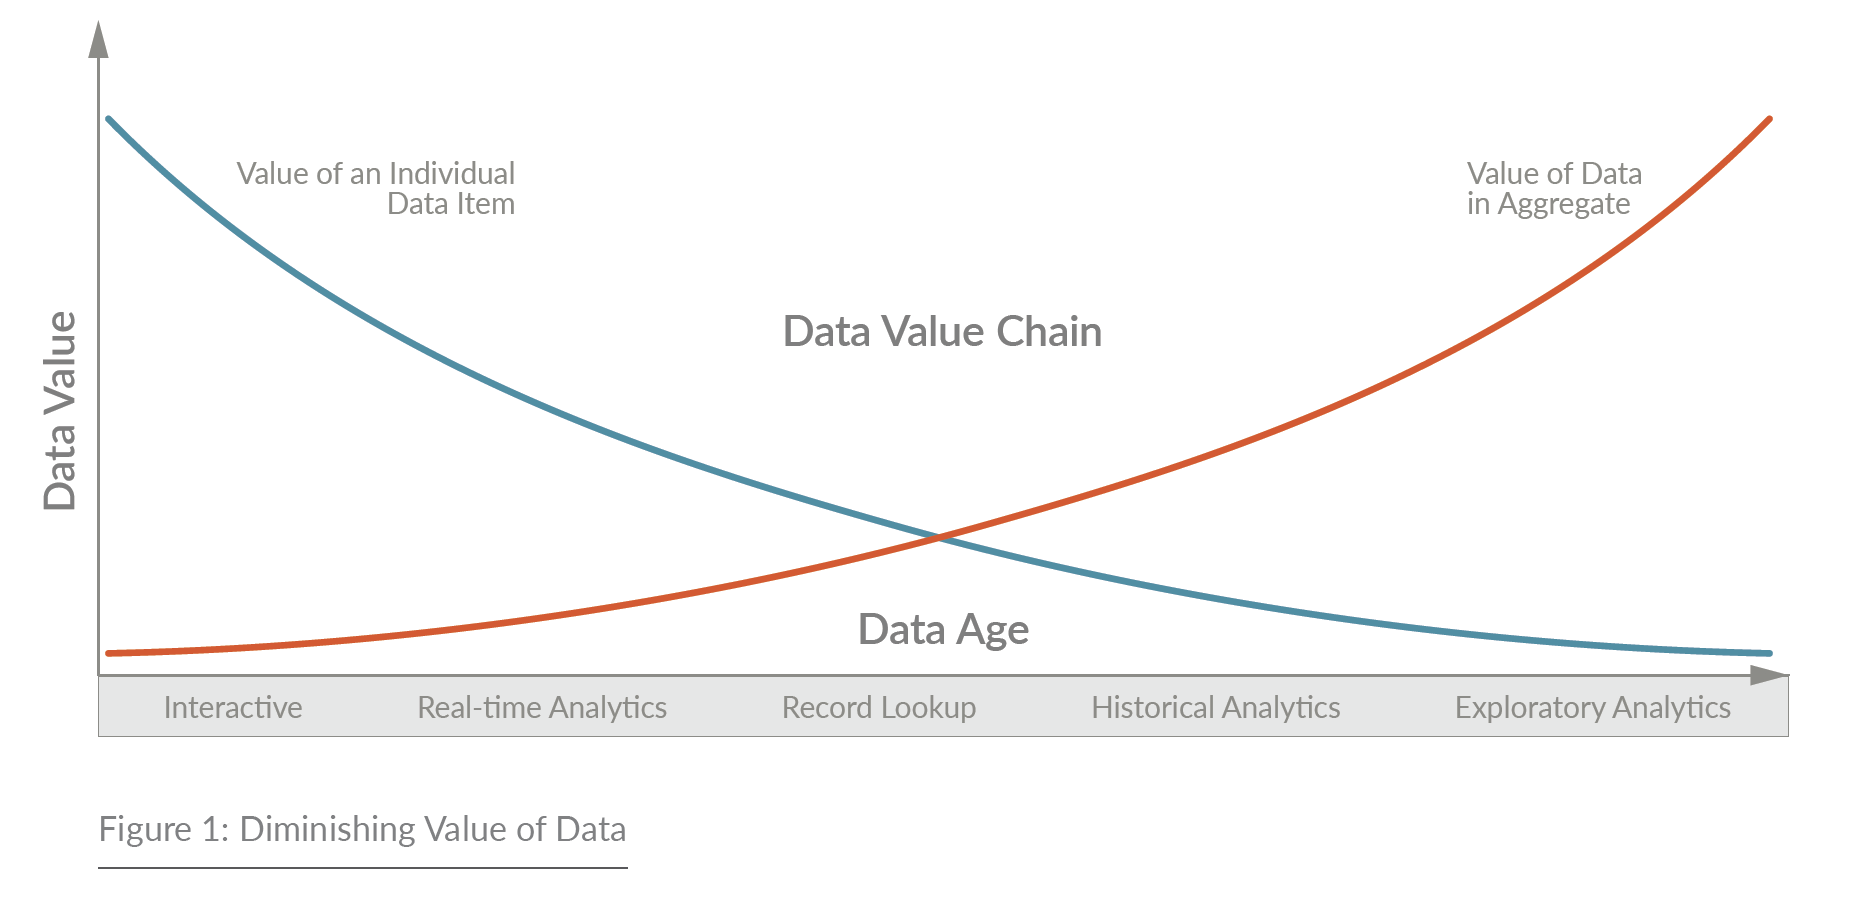 Figure 1: Diminishing Value of Data